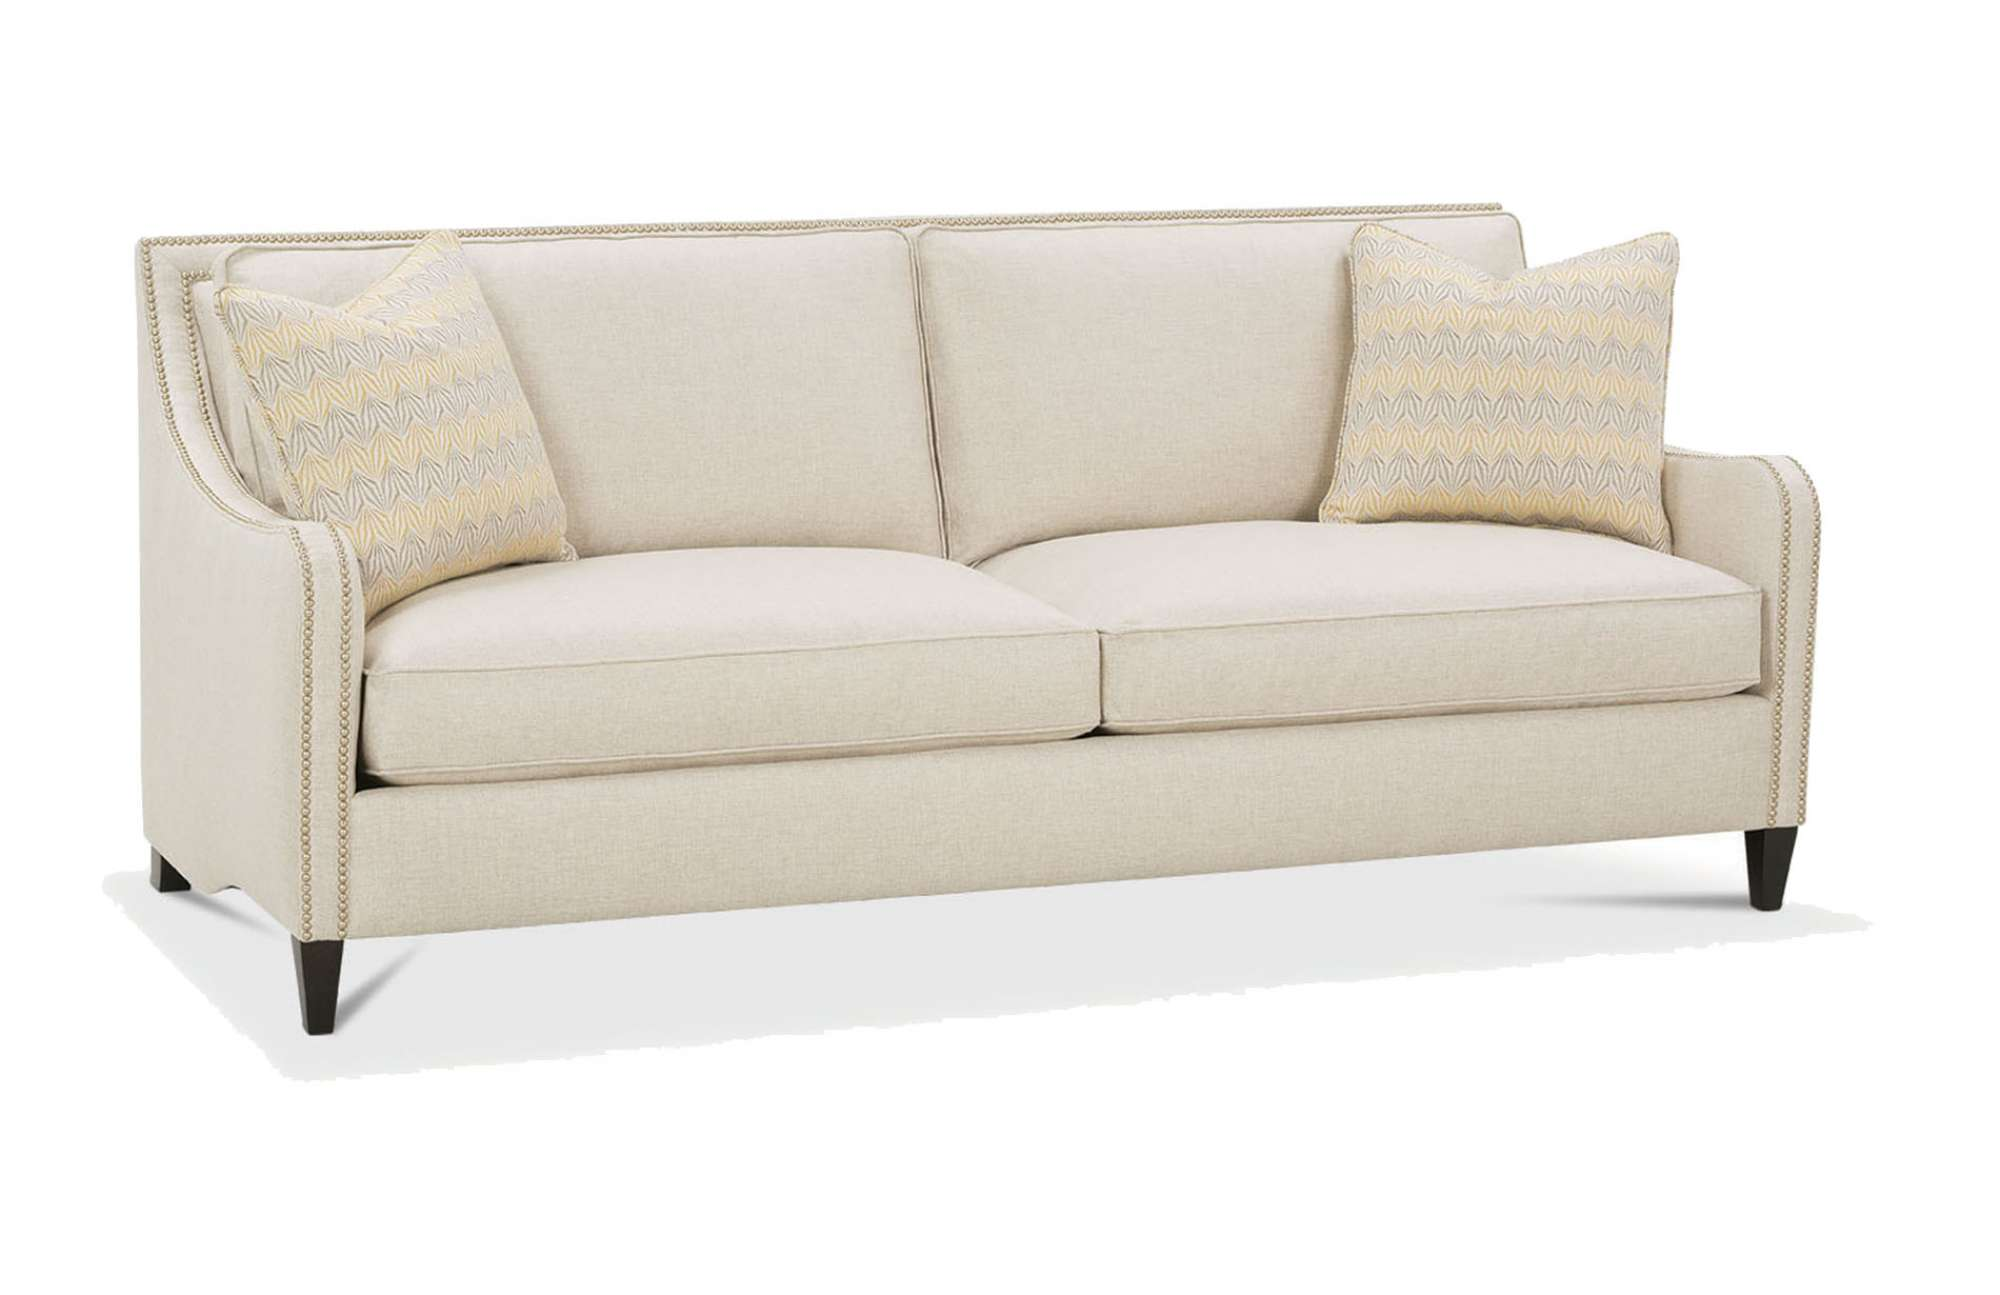 motion sofa definition bed boston caroline  blum 39s furniture co